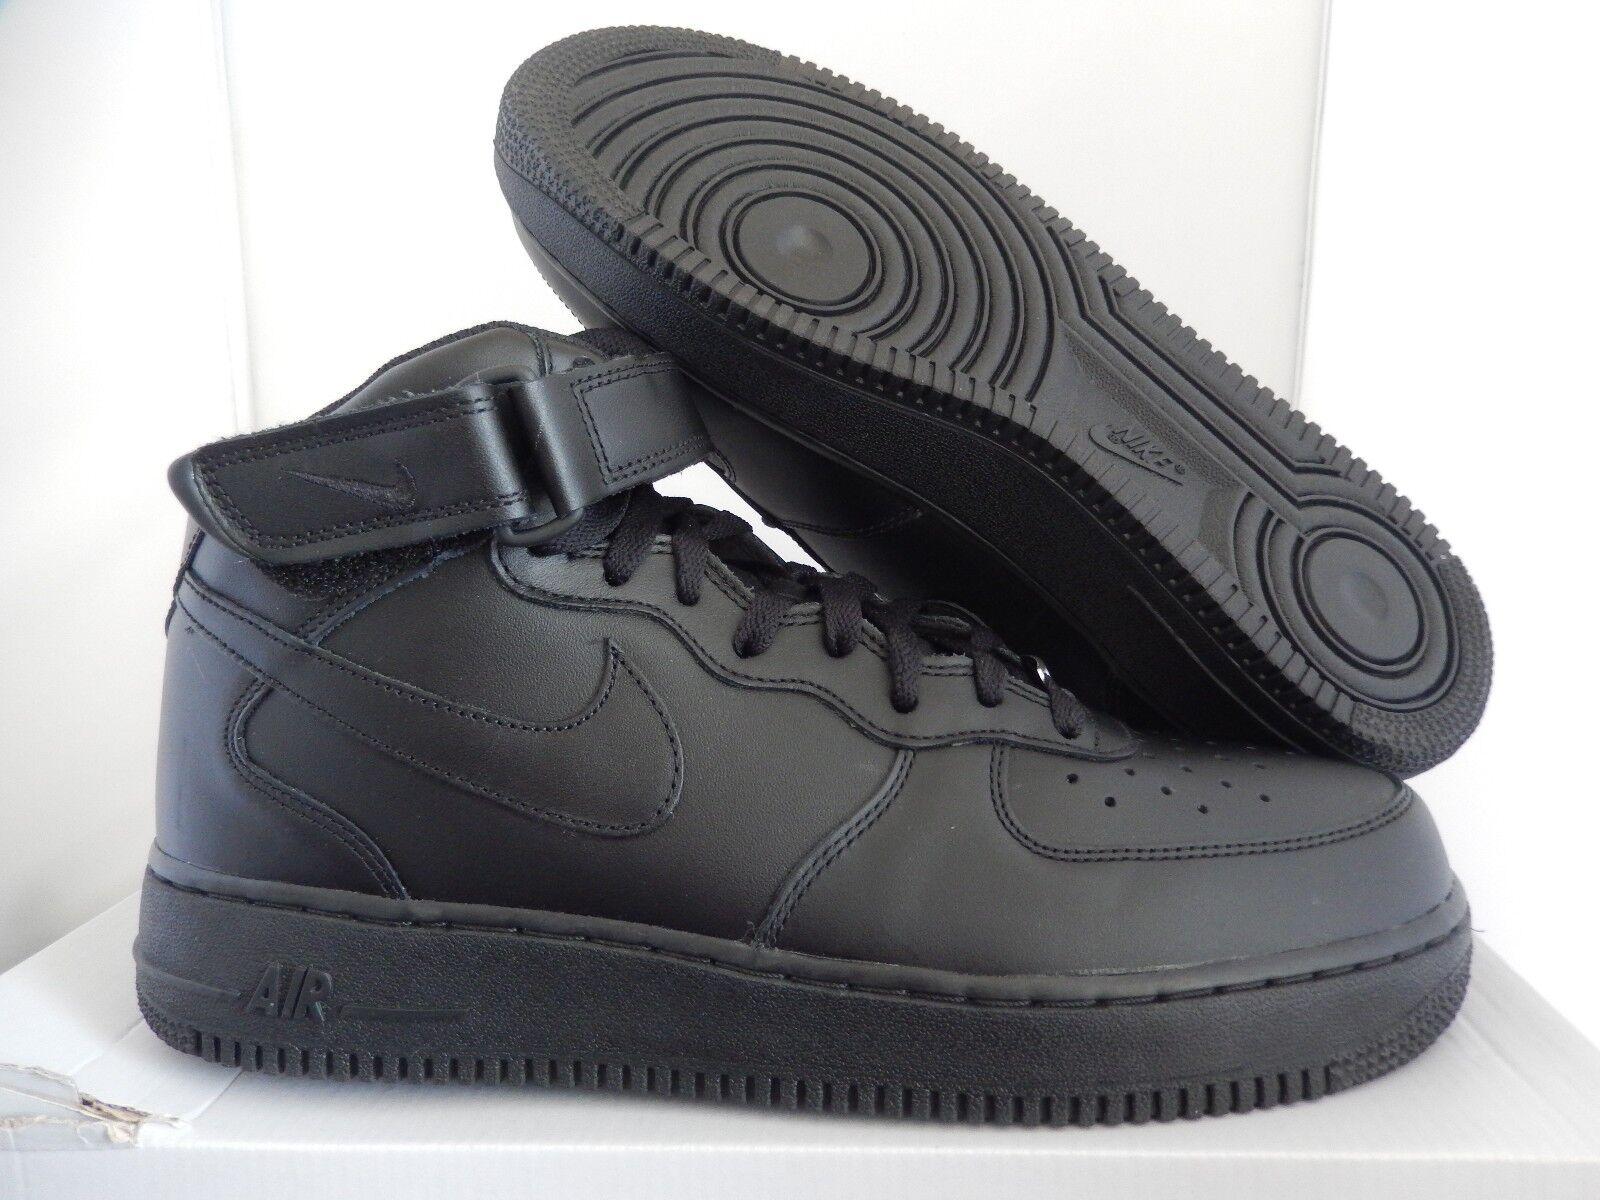 Nike air force 1 mitte 07 - schwarze sz 10,5